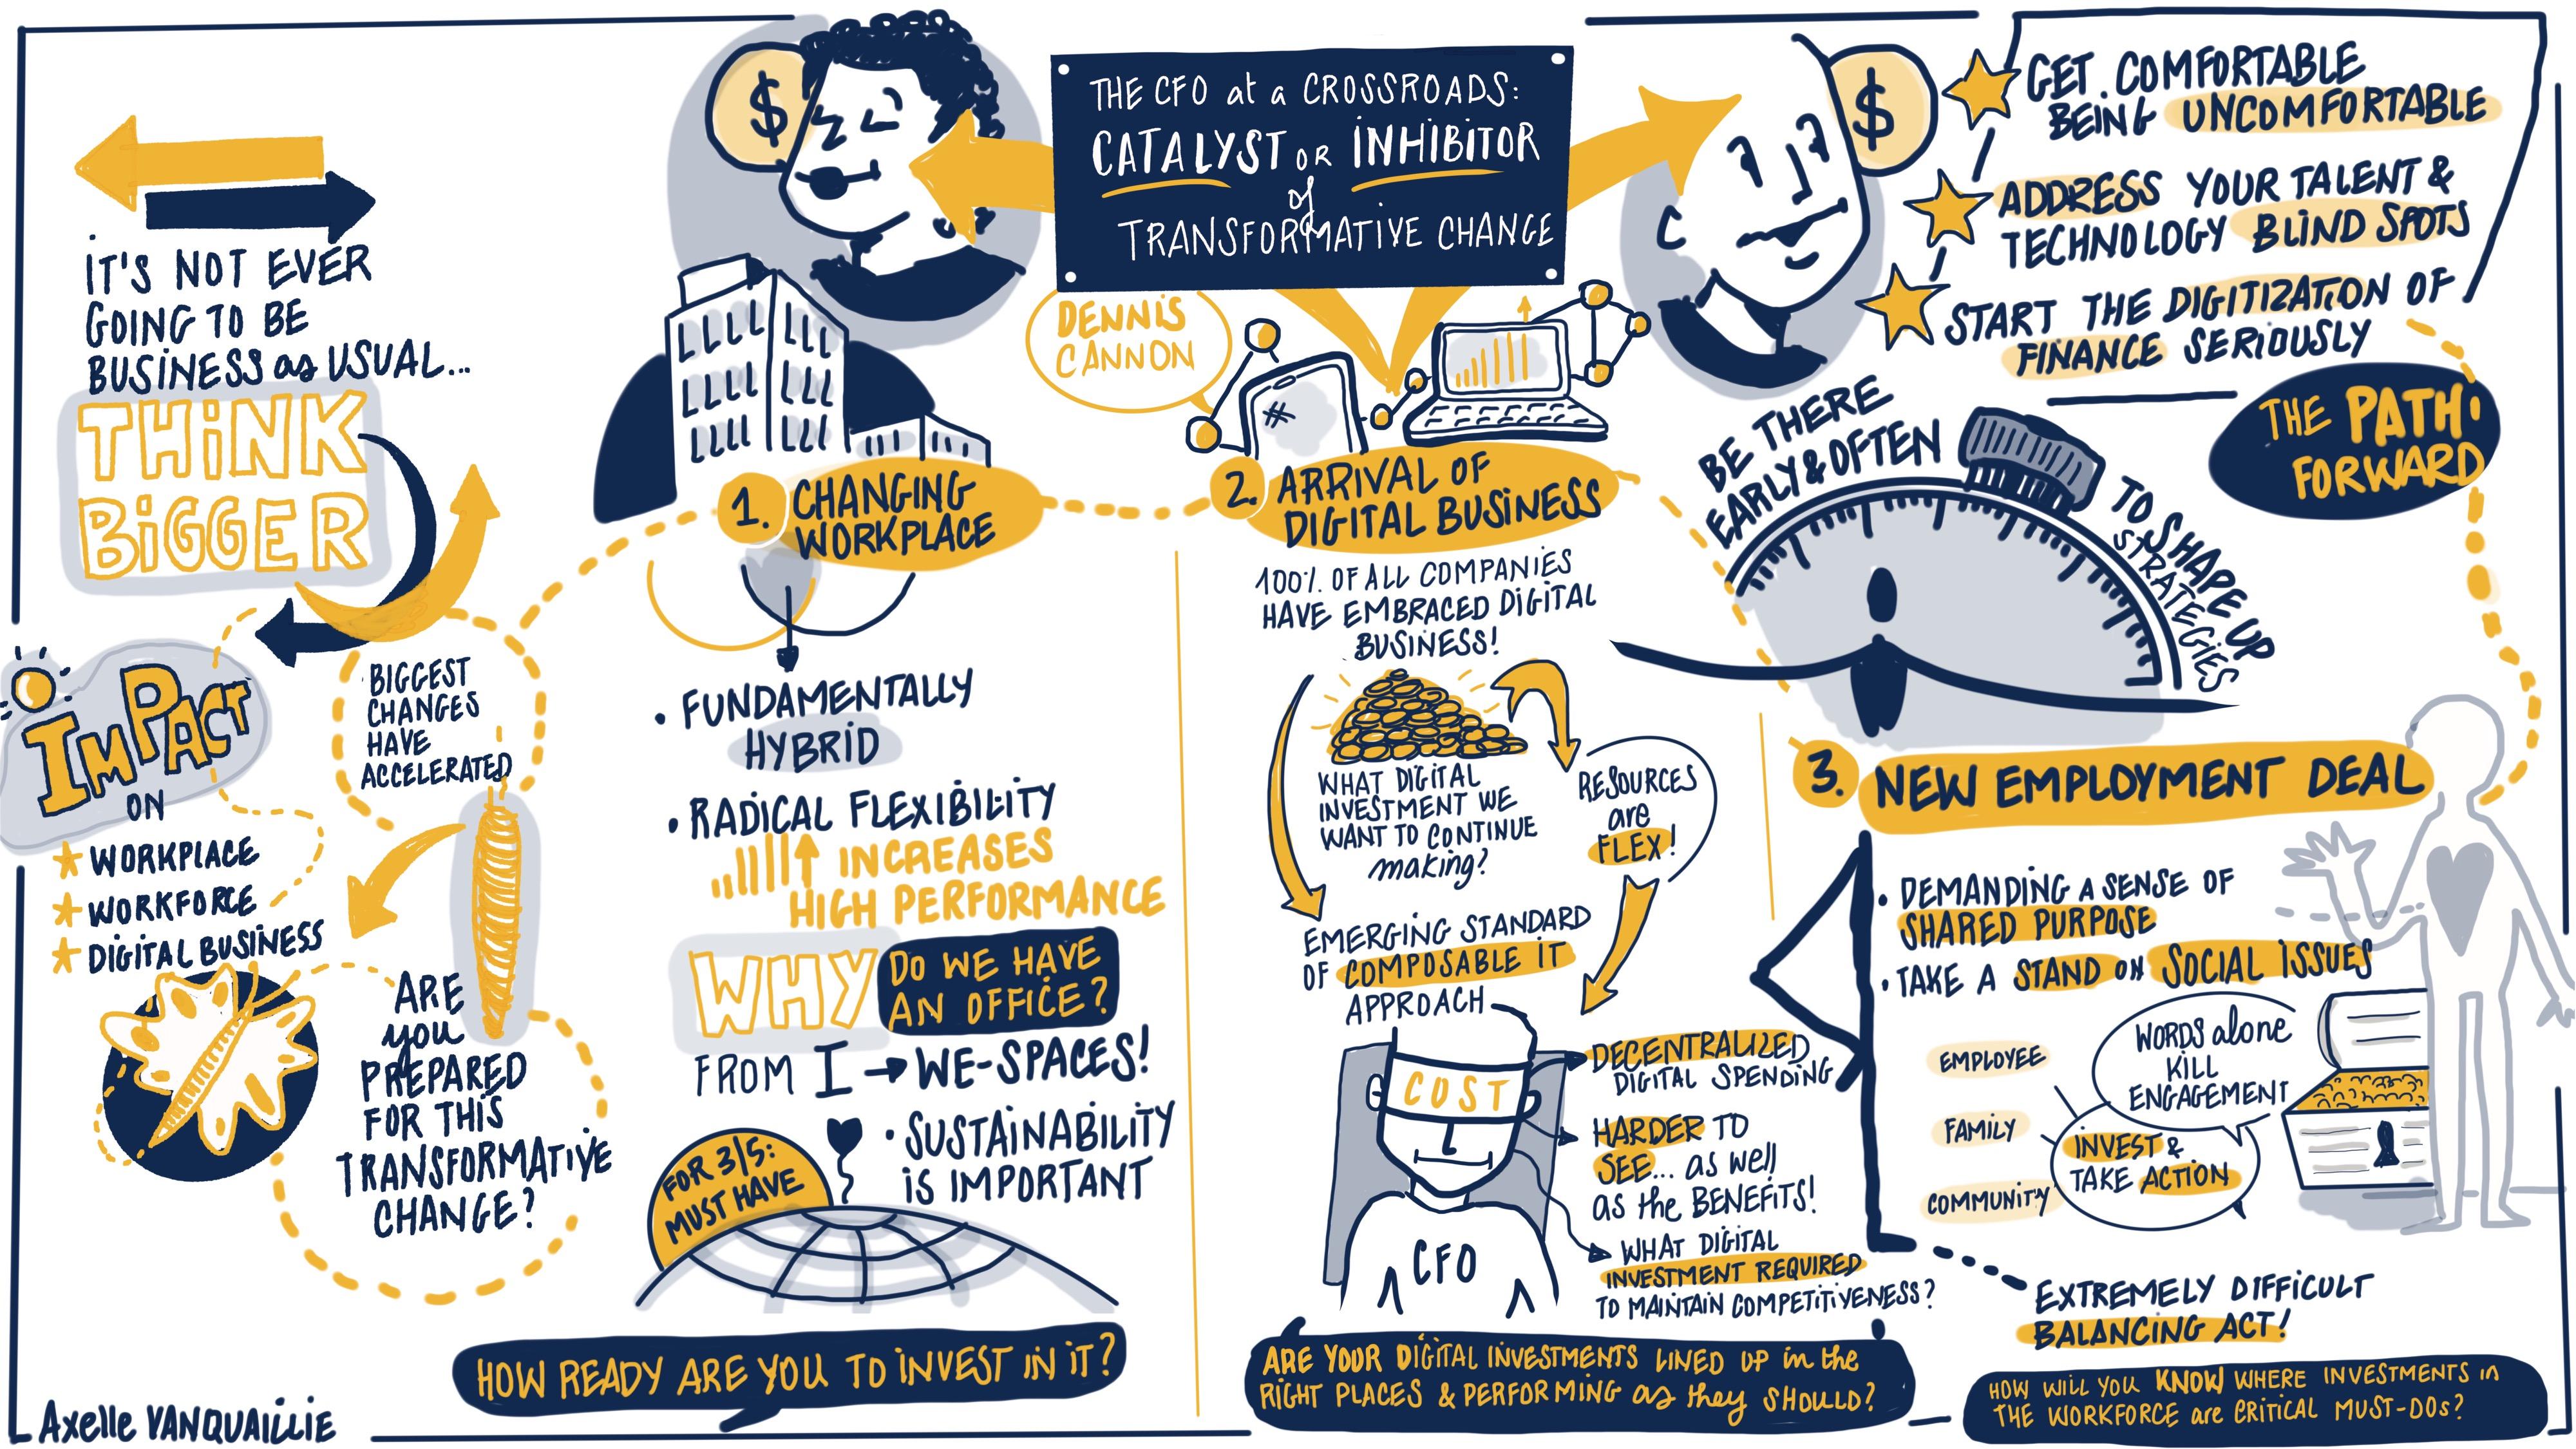 Gartner CFO Conference Opening Keynote Visual Graphic